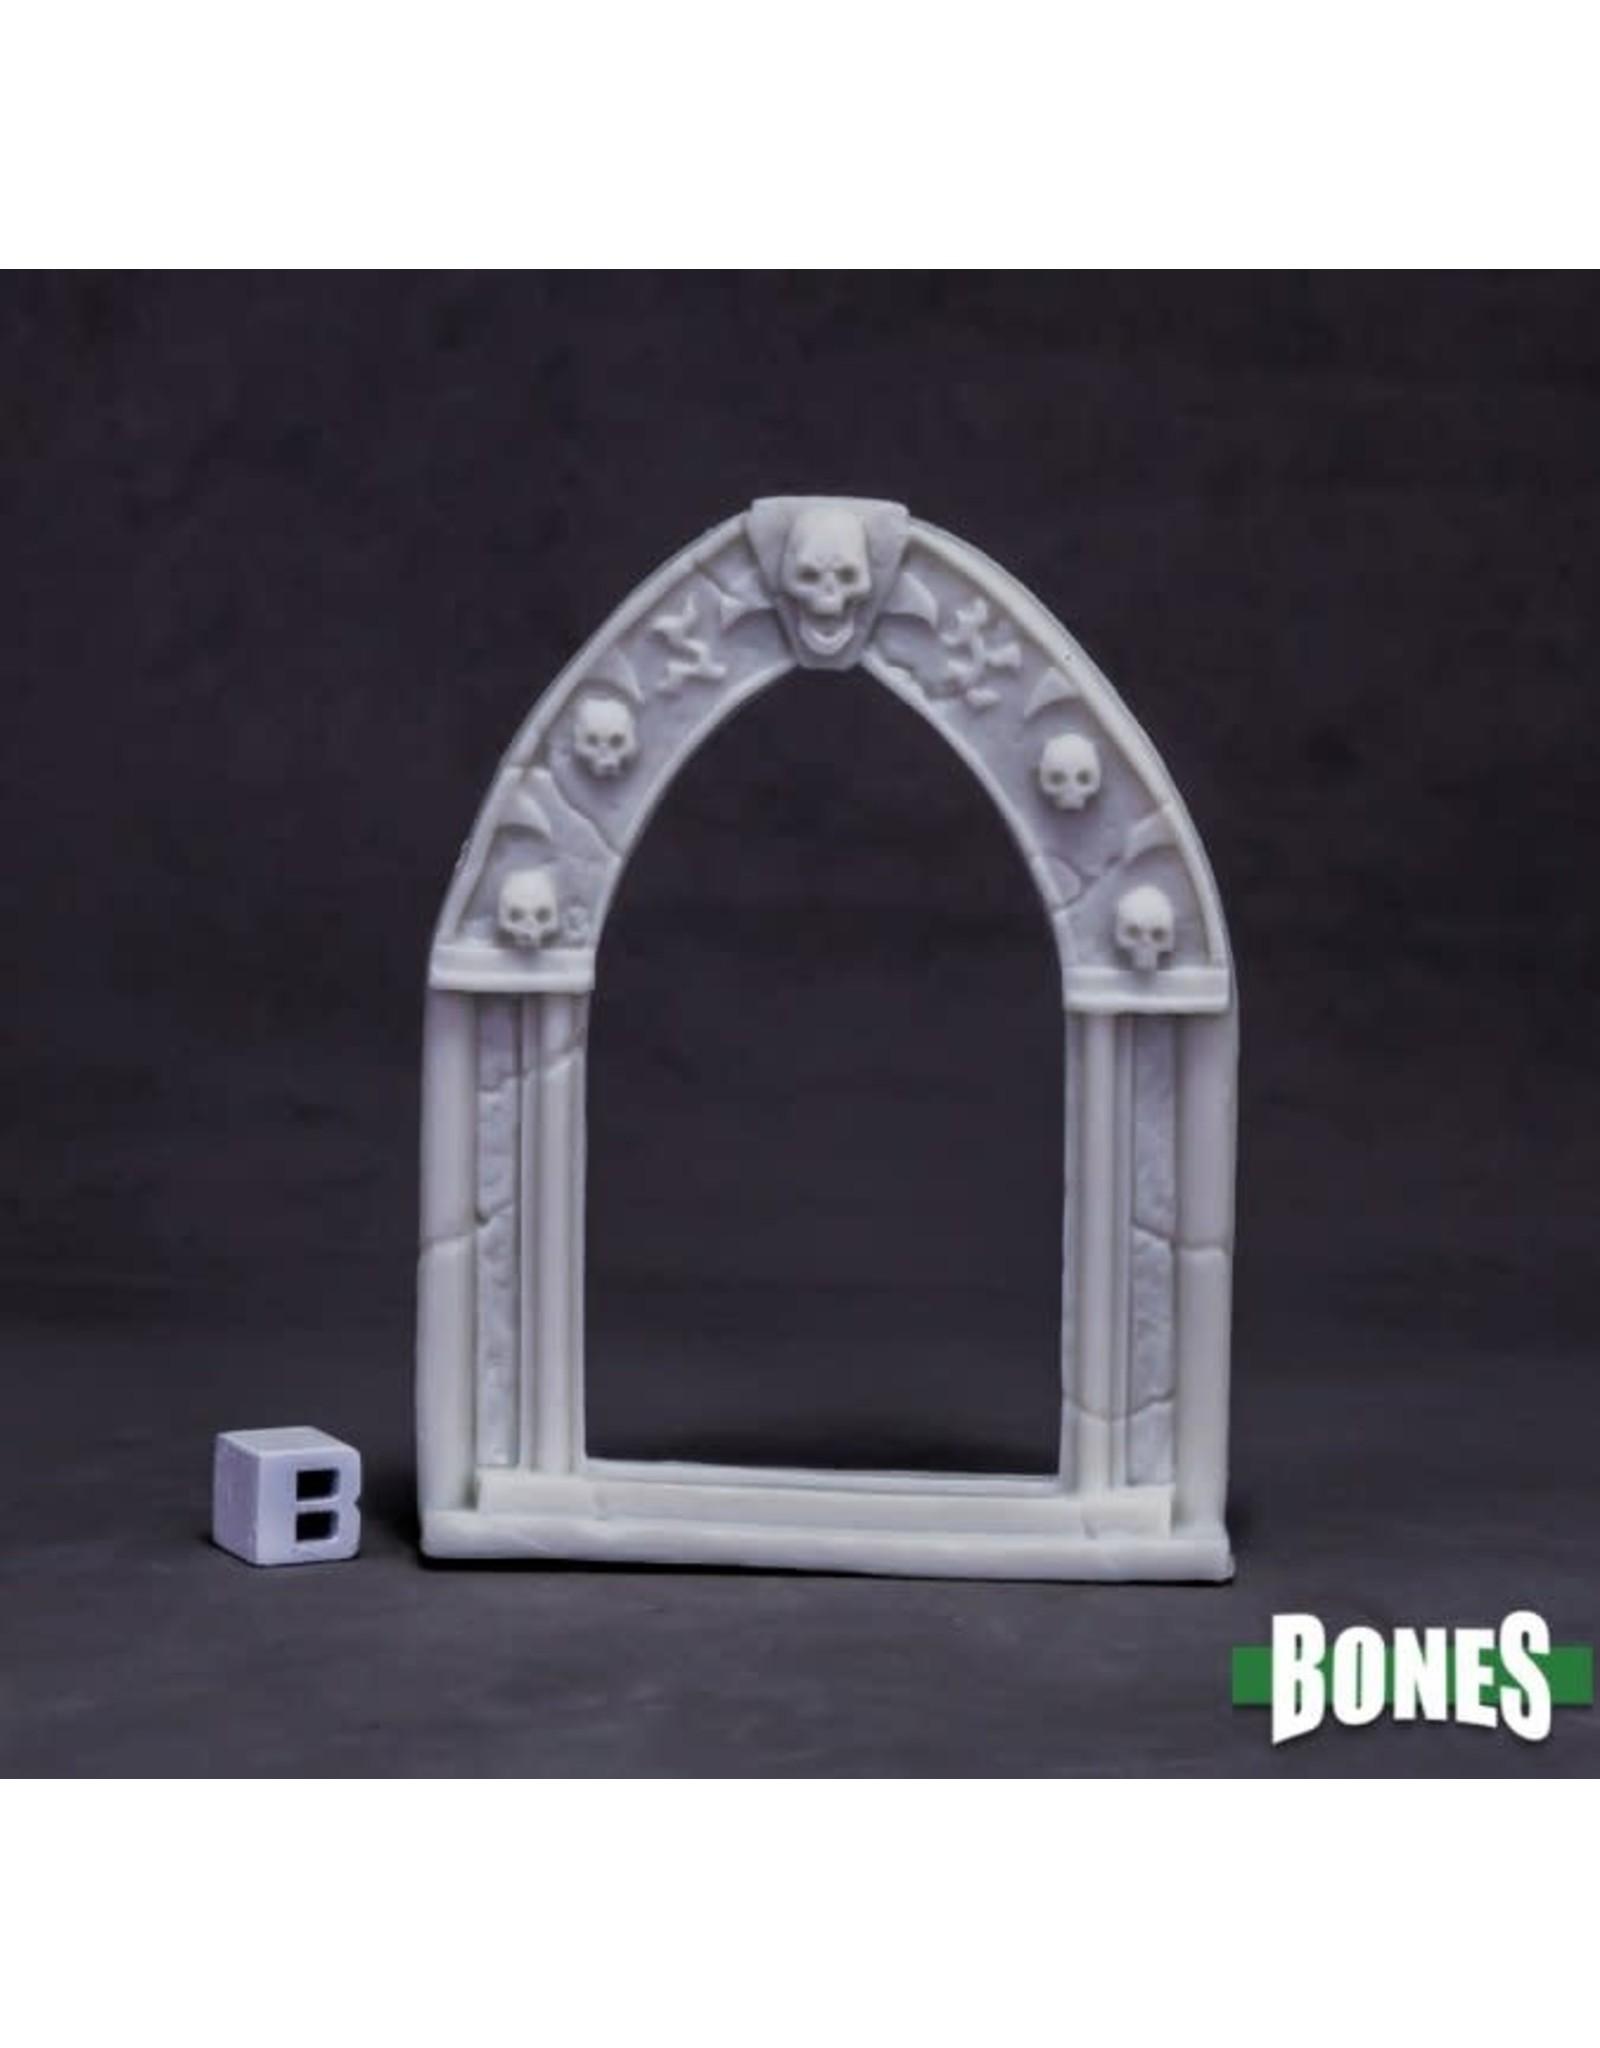 Reaper Miniatures Bones Graveyard Archway